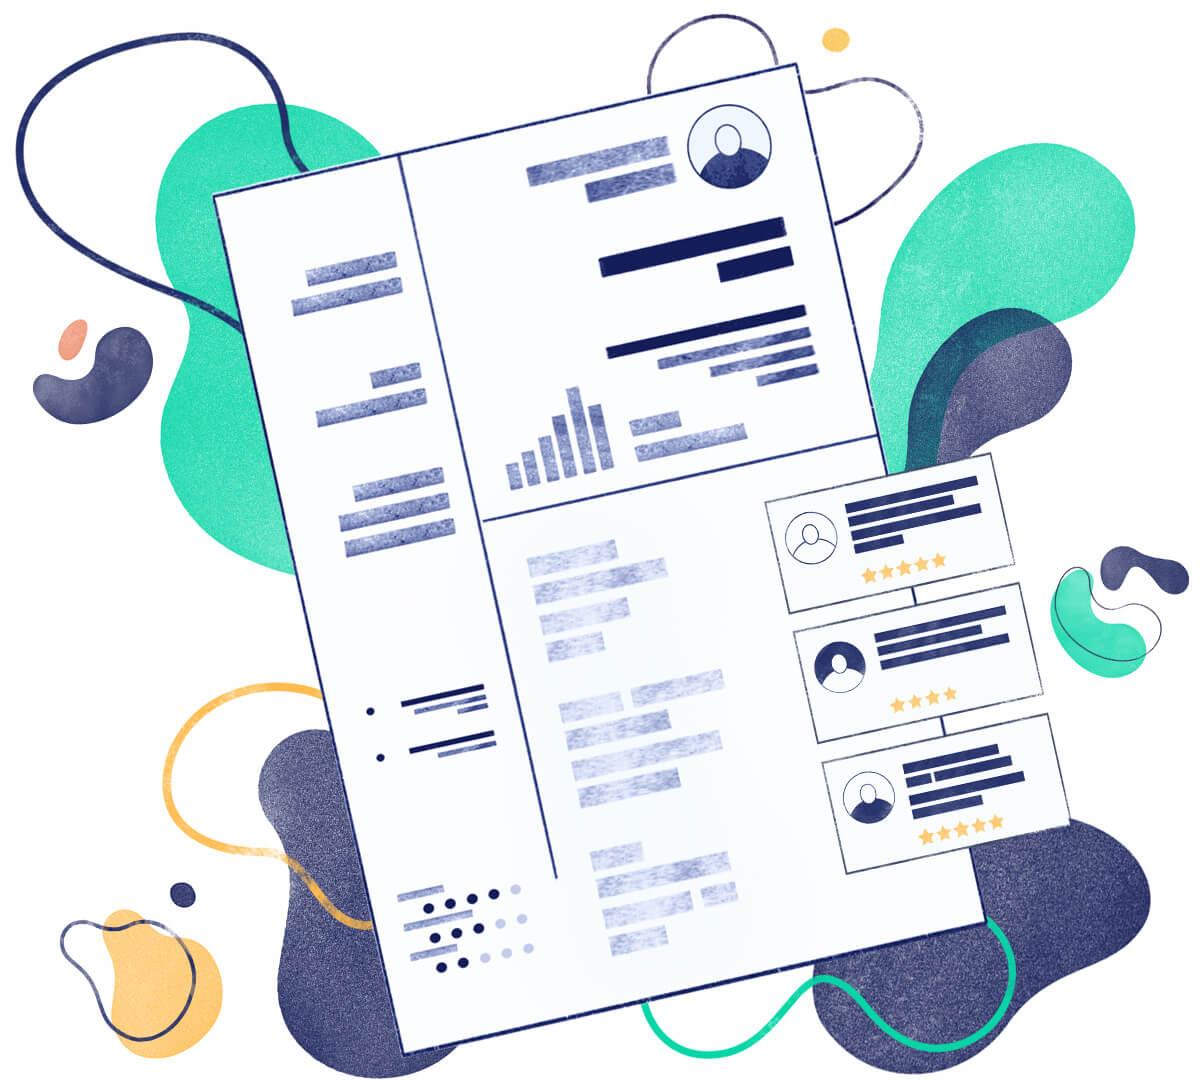 professional references on resume u2014complete guide  u0026 10